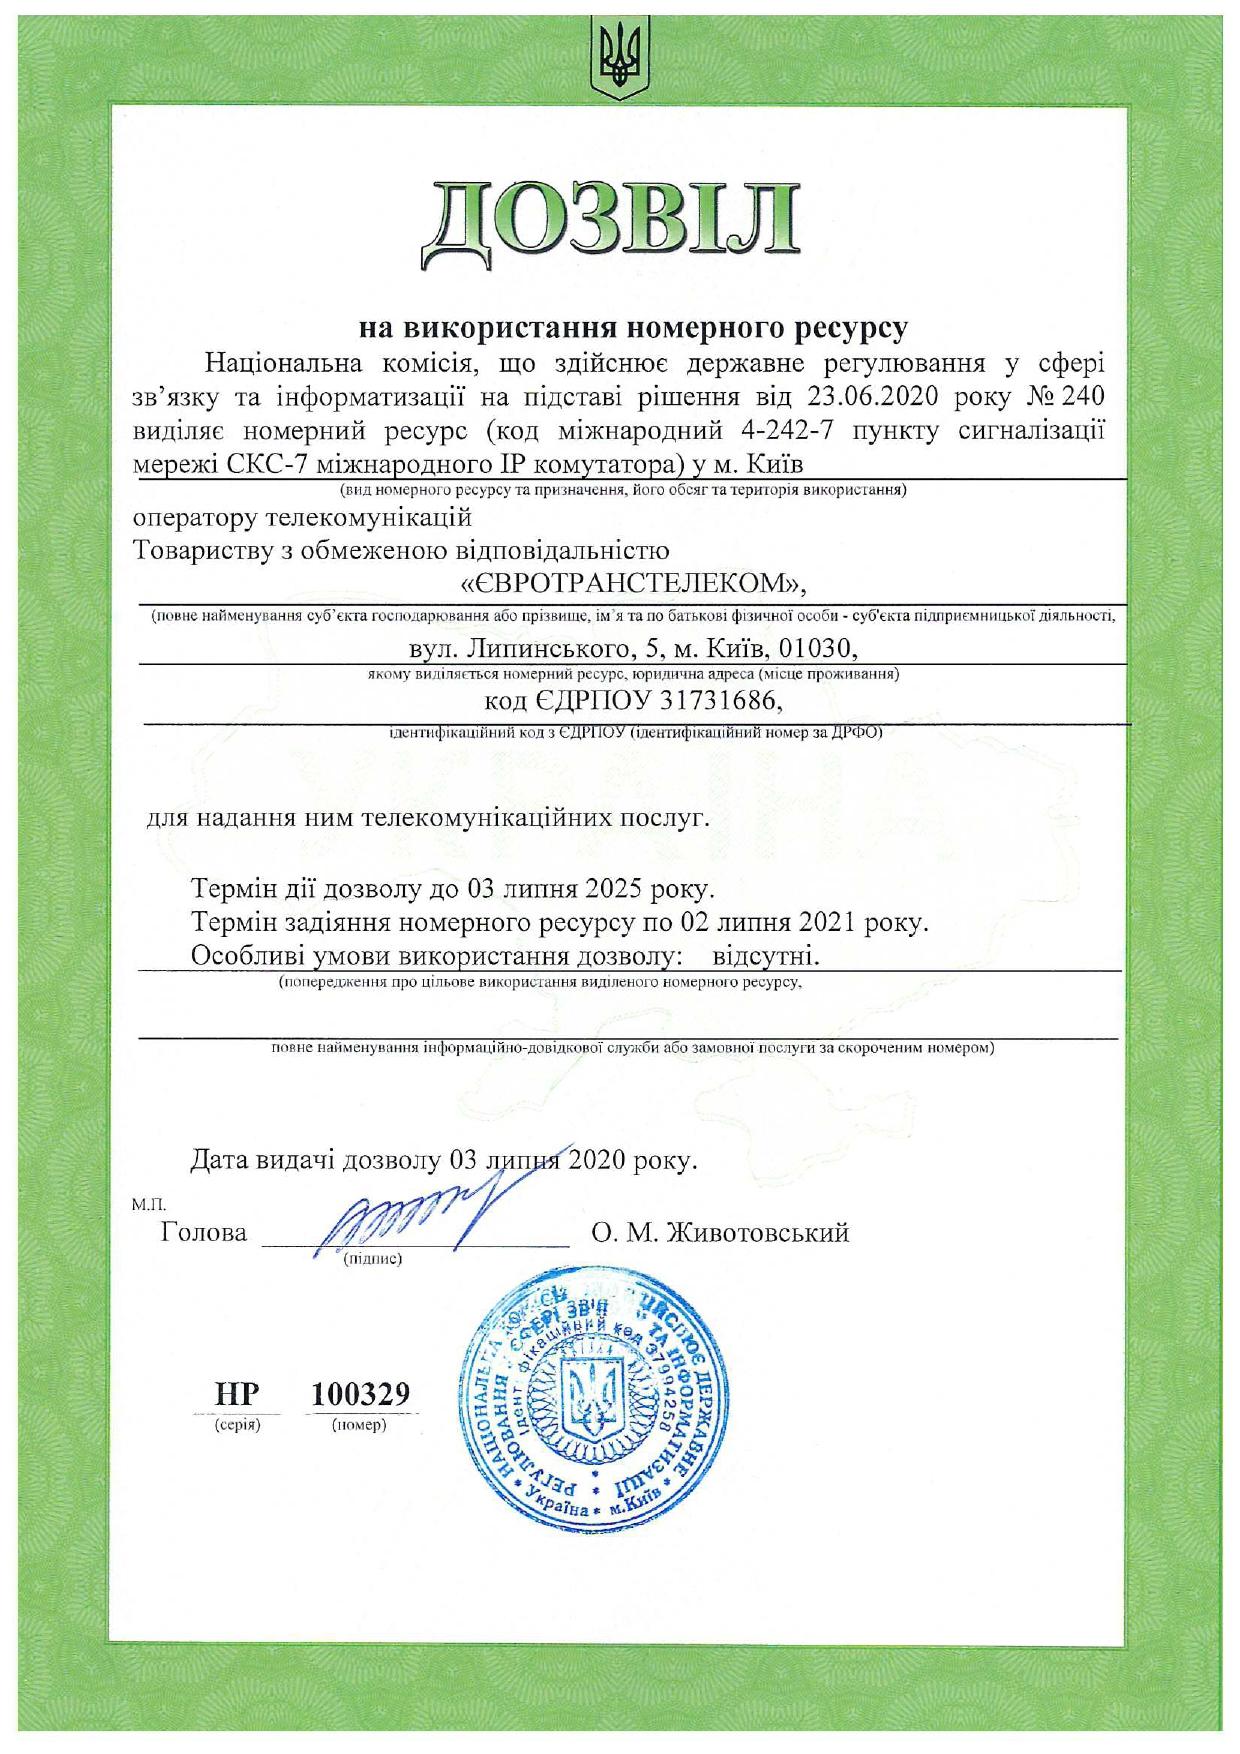 Permit_Kyiv_2